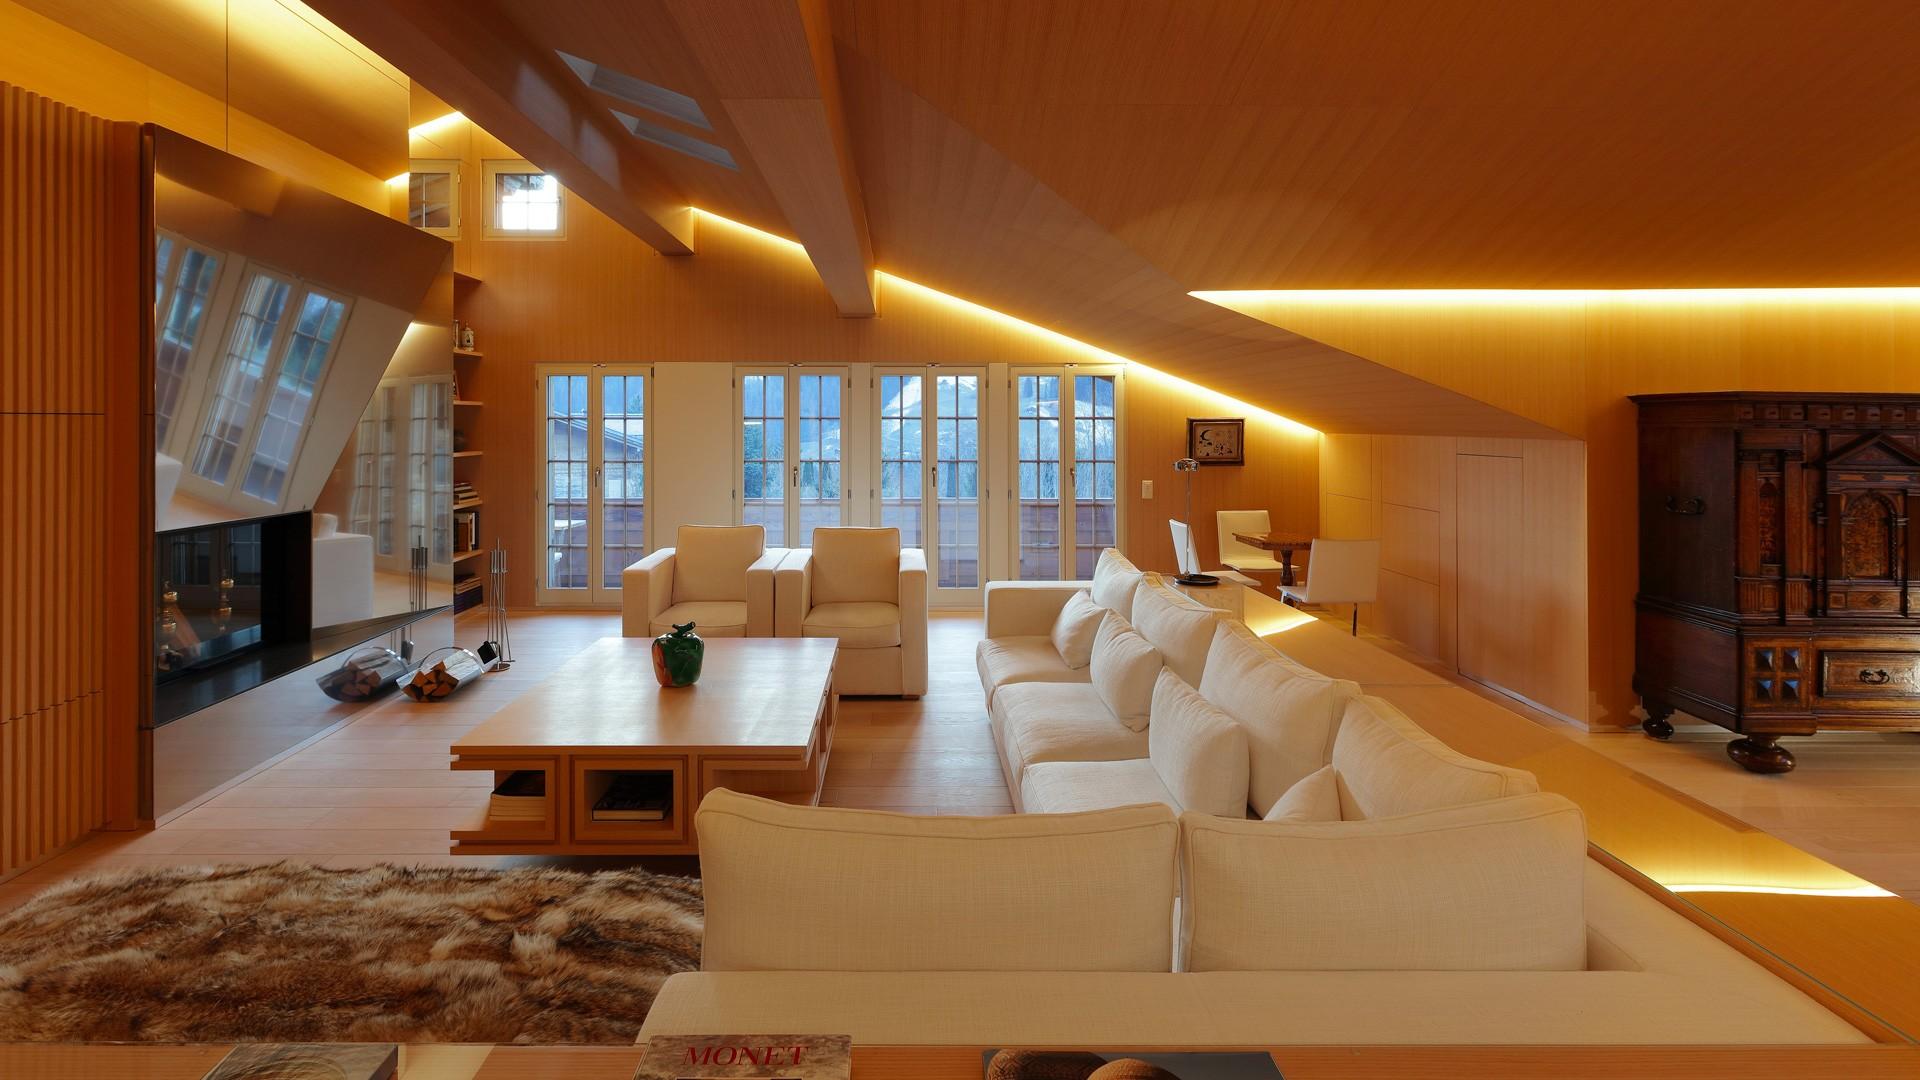 Poliform_contract_residential_ALPINA_APARTAMENTS_05_1920x1080px_gallery